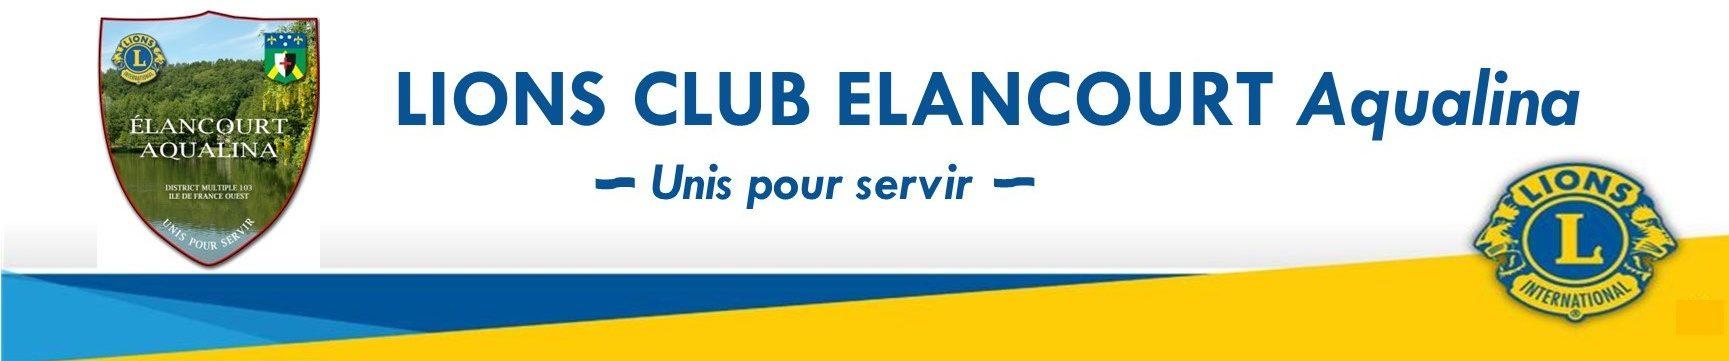 Lions club ÉLANCOURT Aqualina